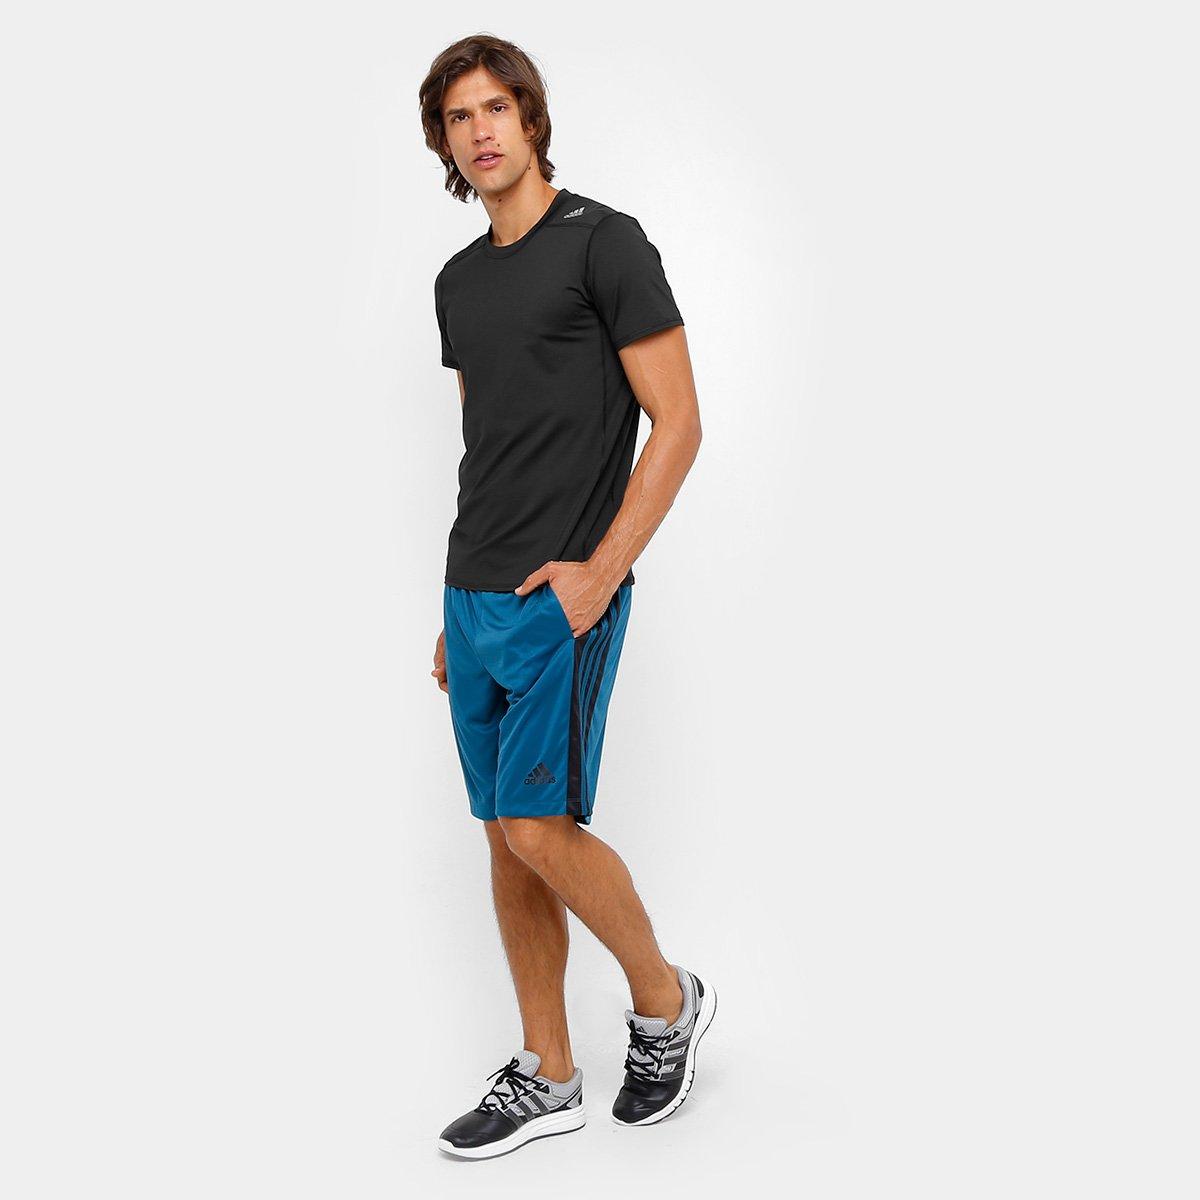 7b666f2b4a27b Camiseta Adidas Tf Base Fitted M Masculino - Compre Agora